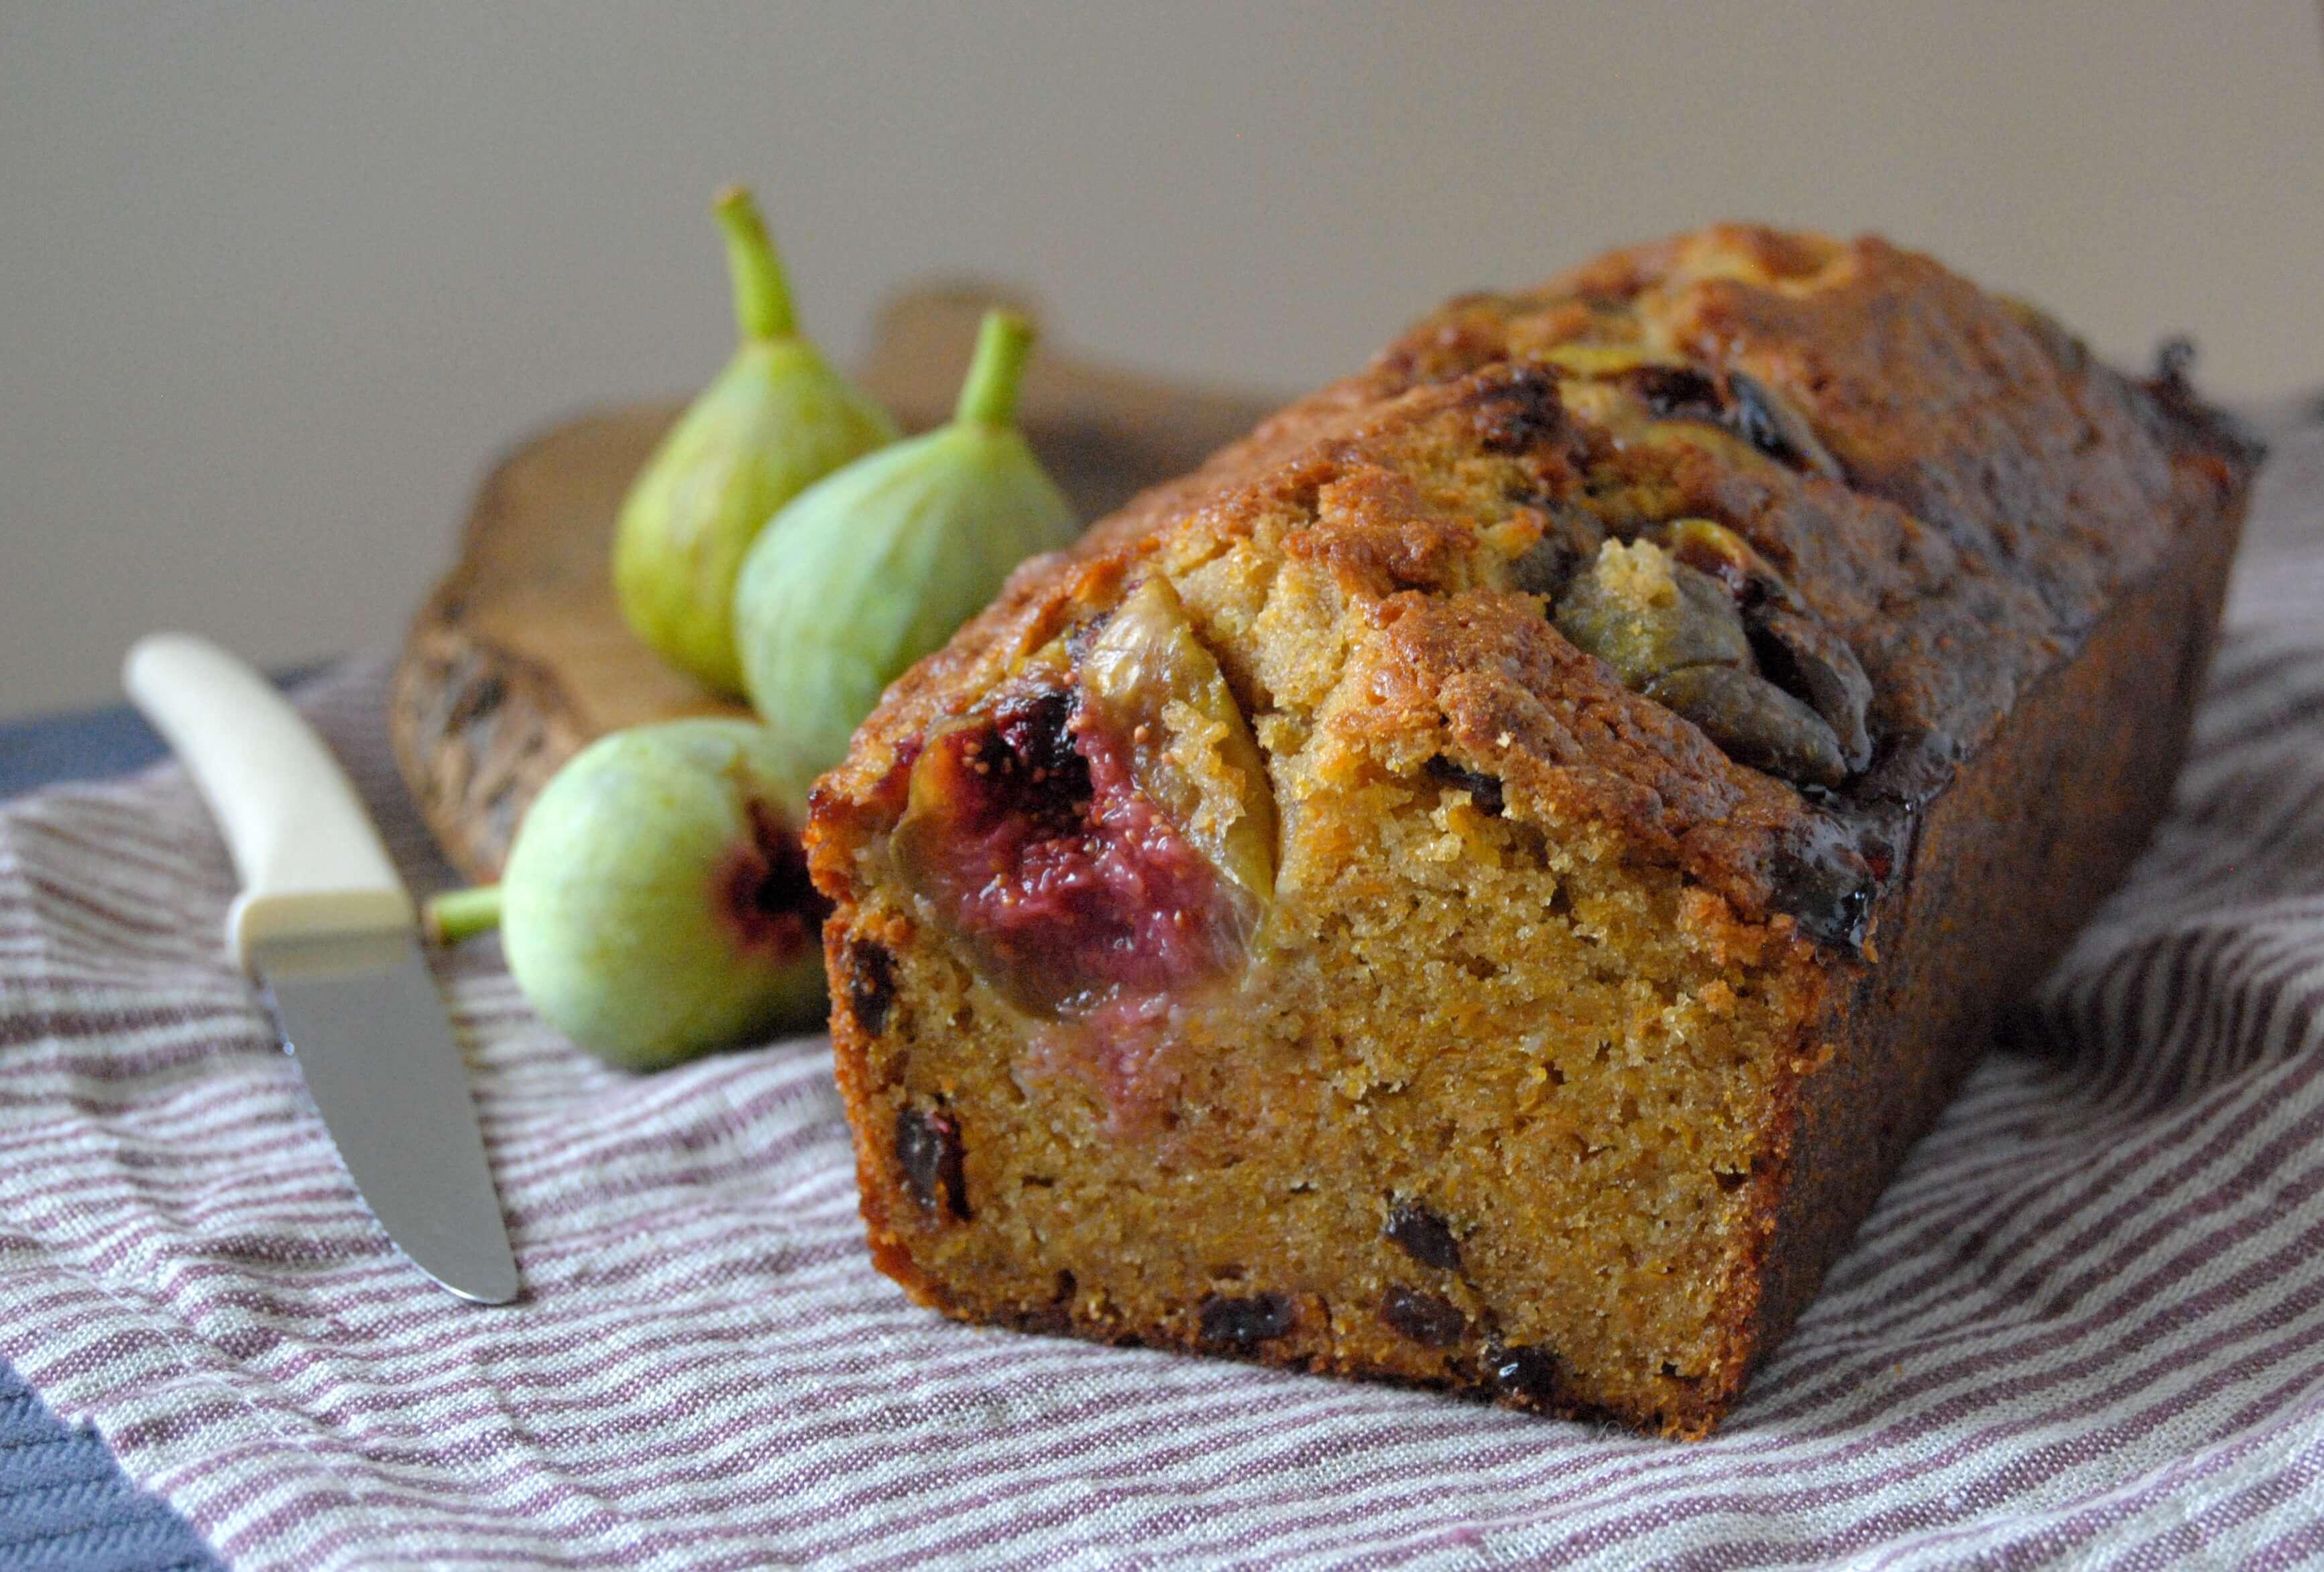 cake-aux-figues-patate-douce-et-epices